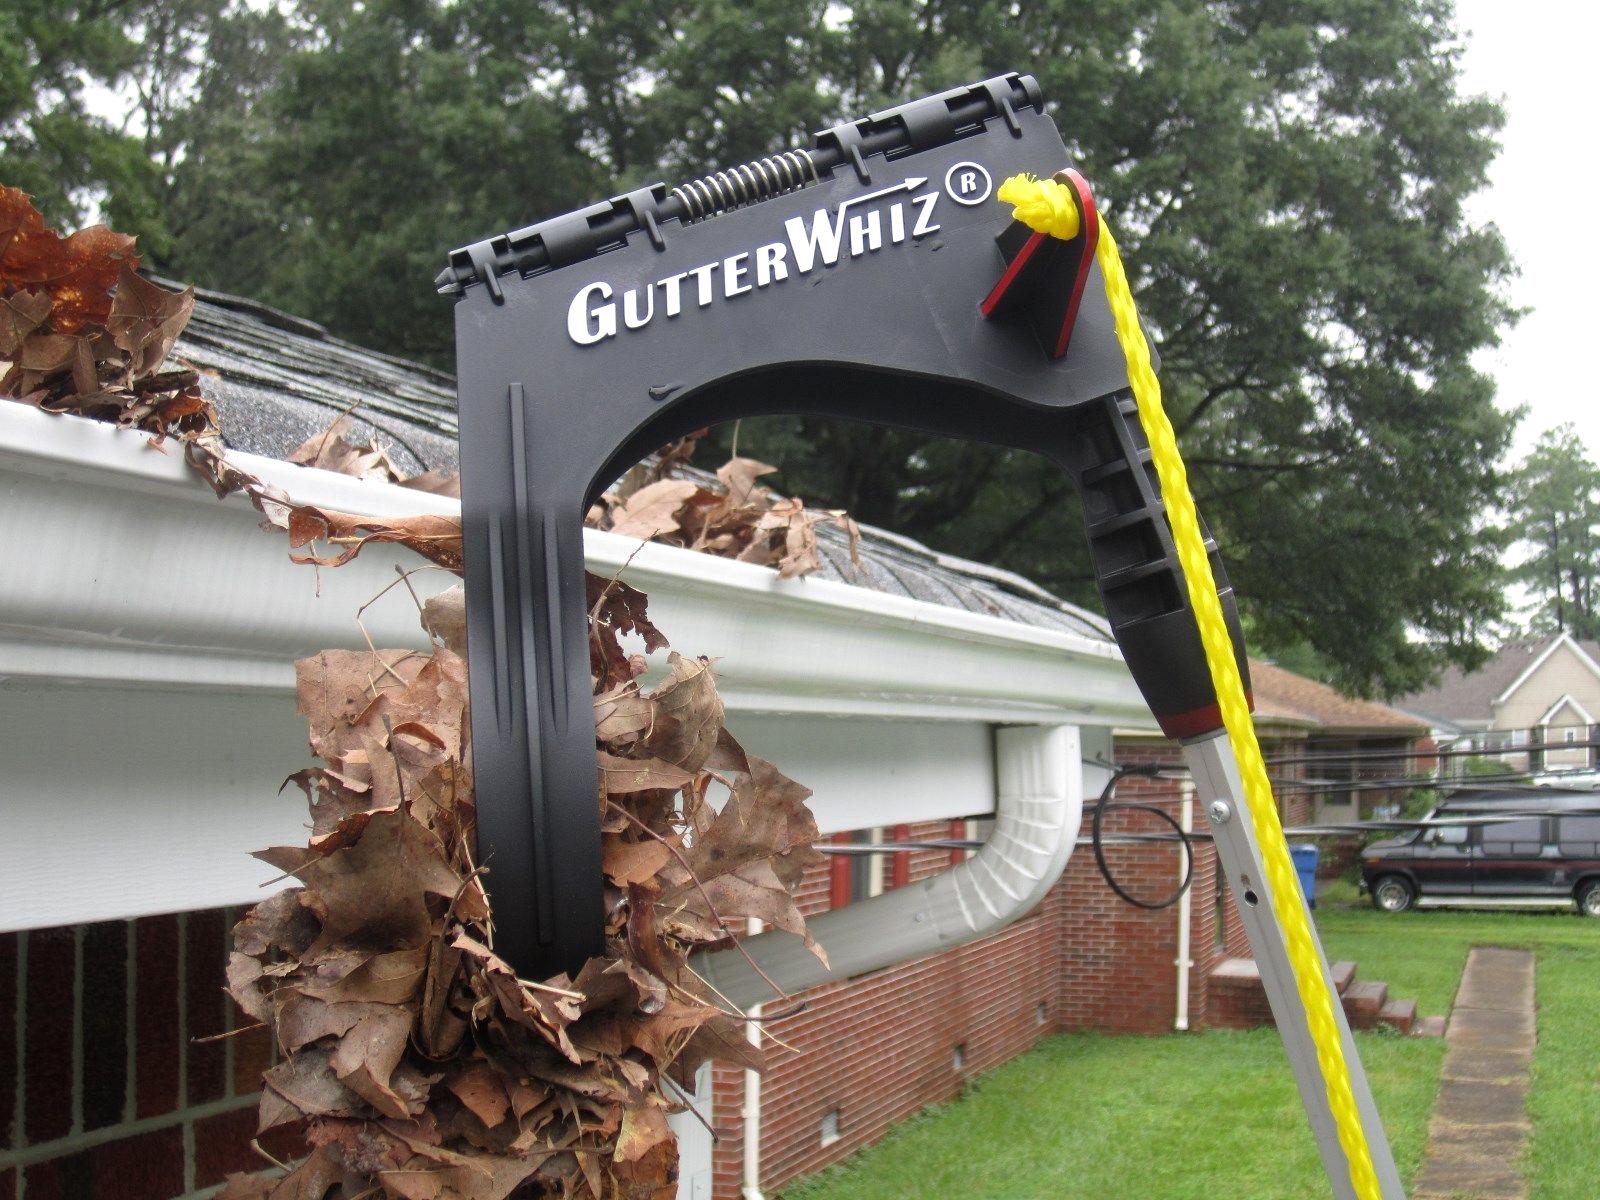 Gutterwhiz Gw1 The Best Gutter Cleaner Diy Cleaning Ebay